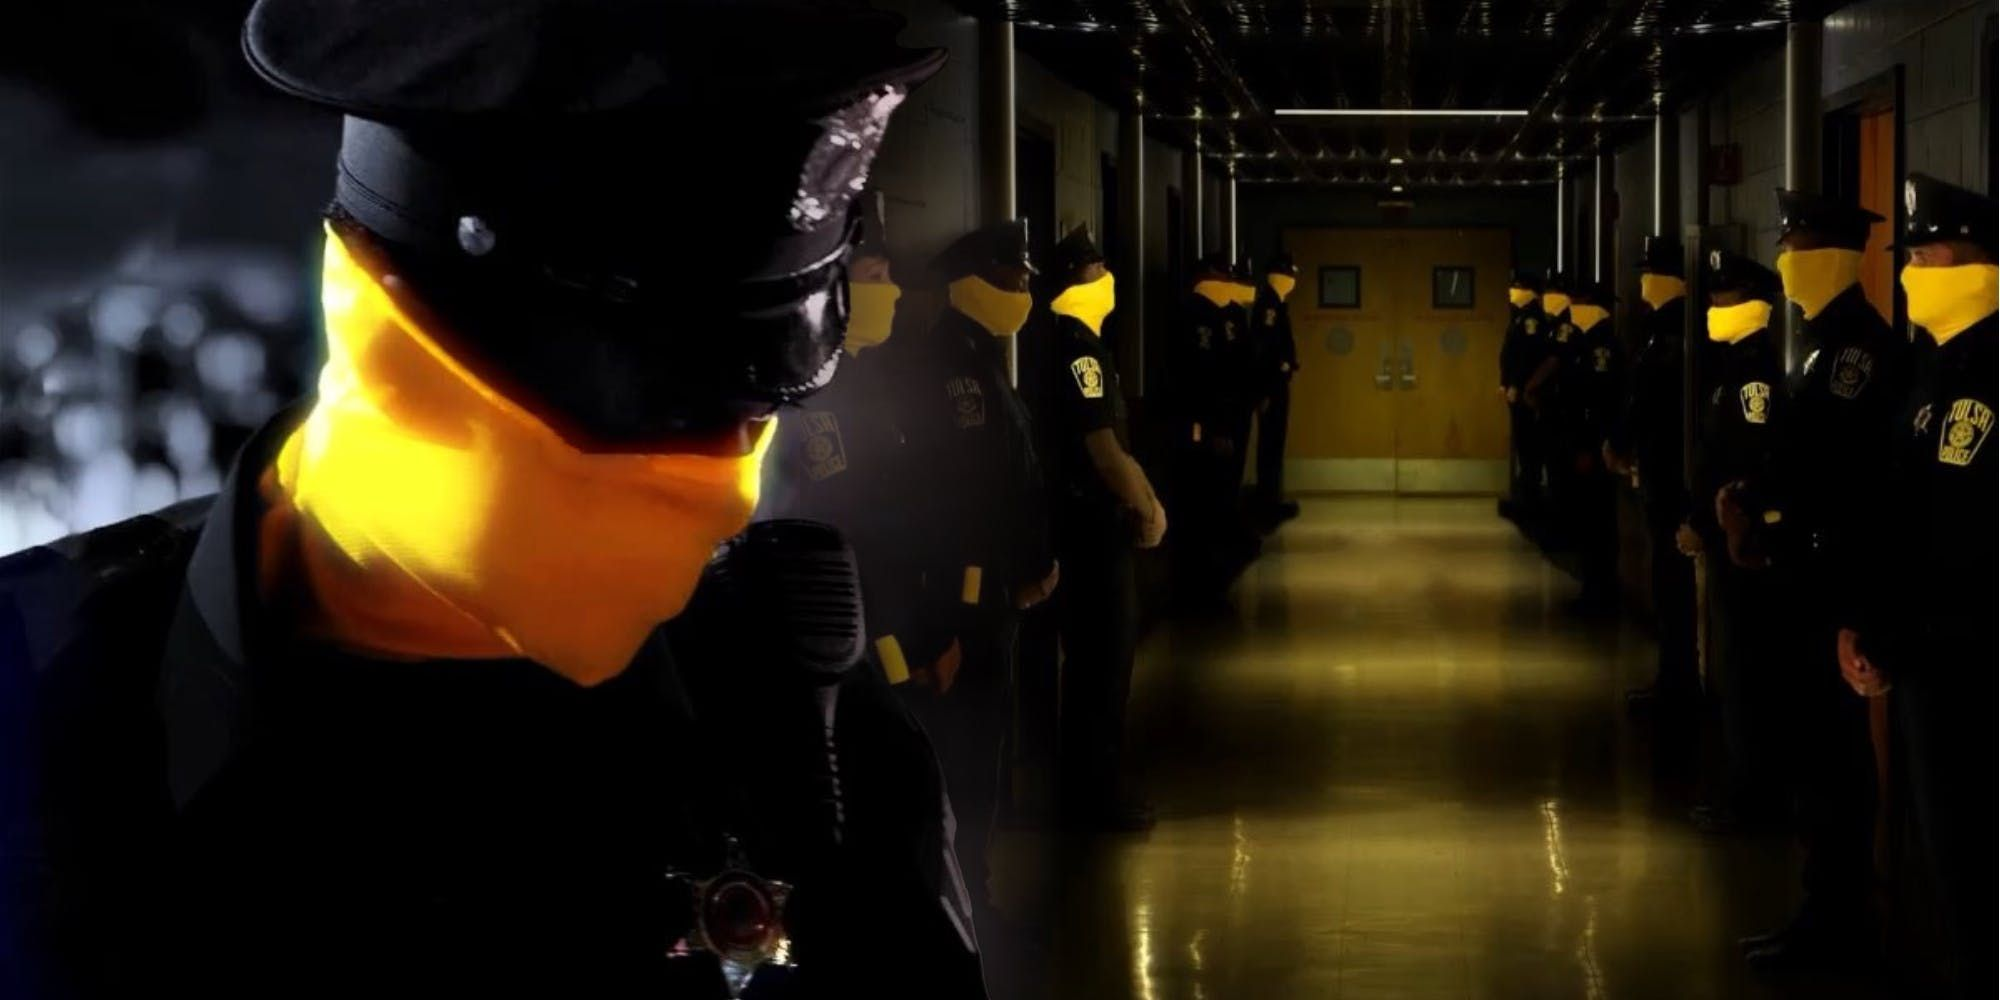 watchmen tv series - HD2000×1000